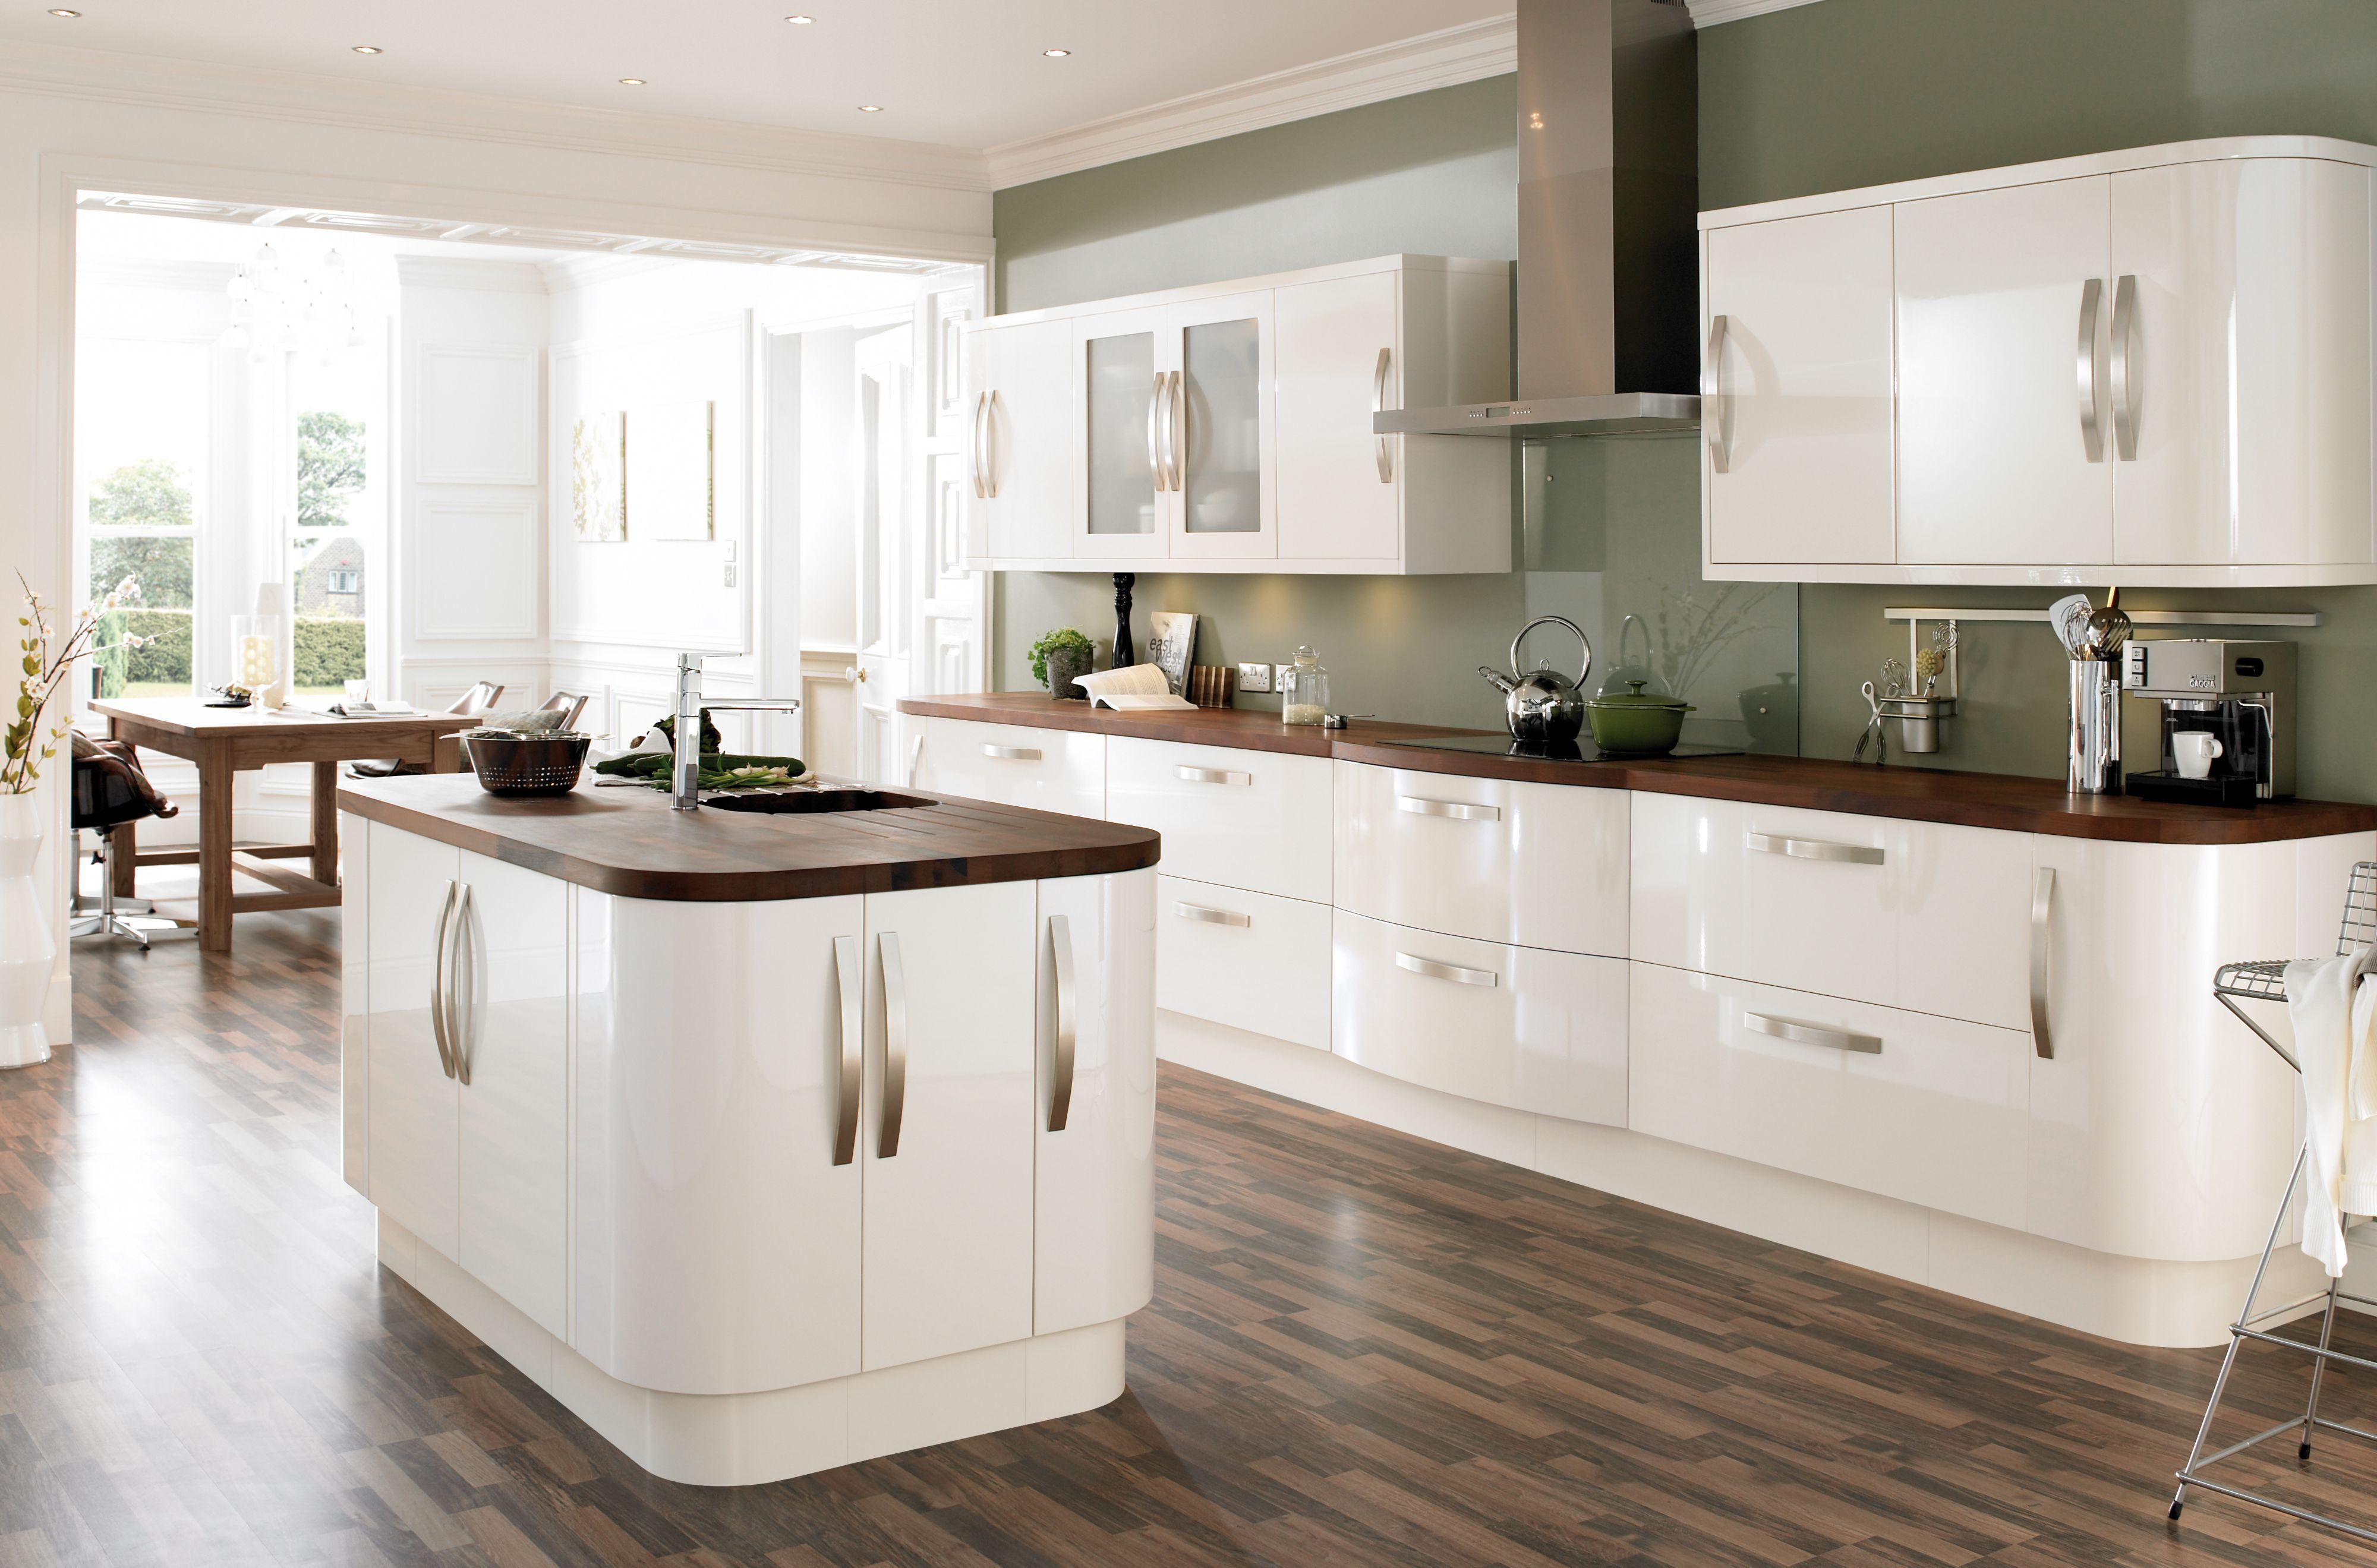 Big Space Kitchen Range Reviews In Oven Range Hood Reviews